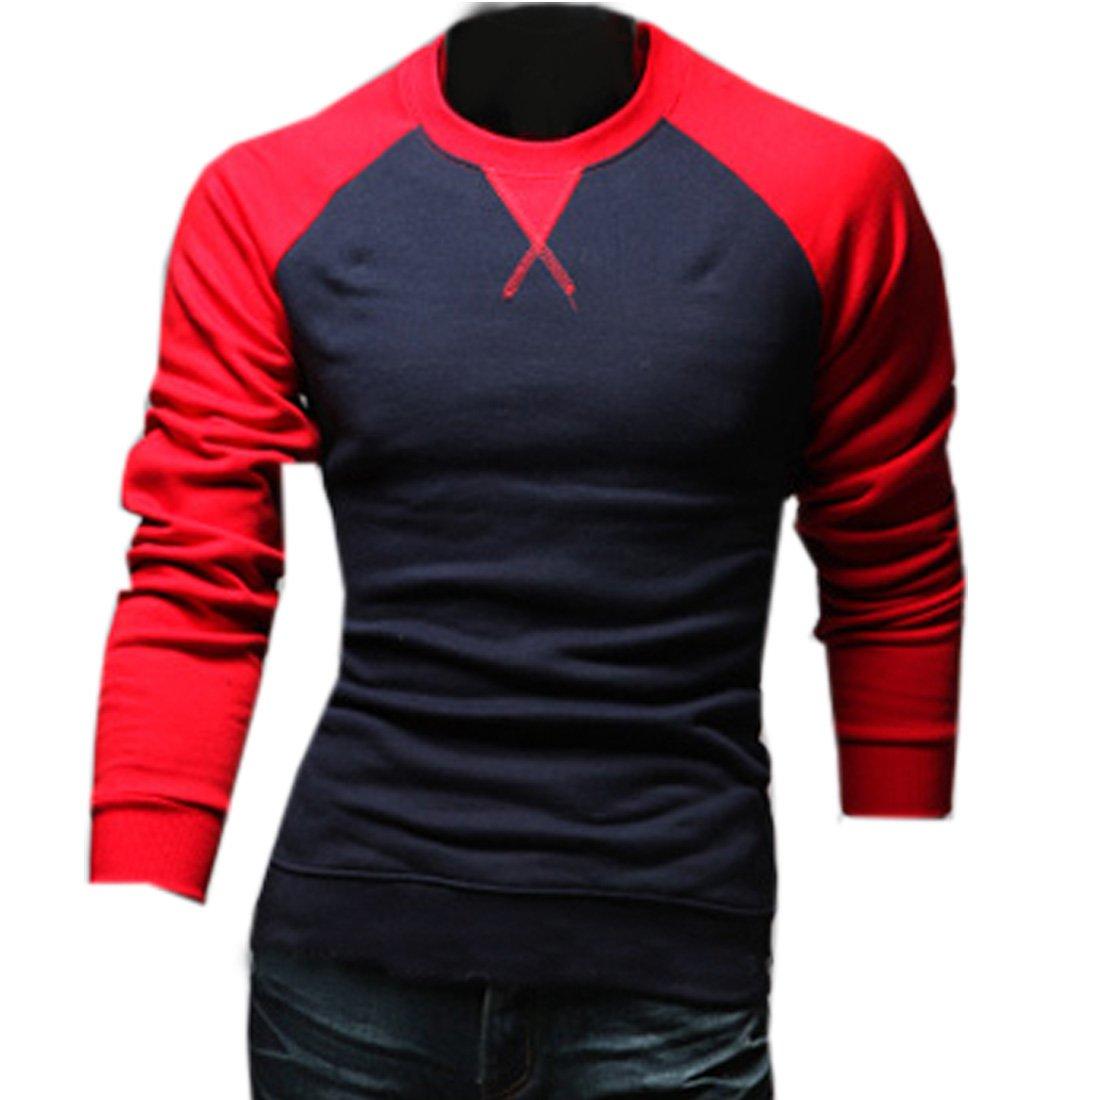 Cozy Age Men's Contrast Color Casual Sports T-shirt